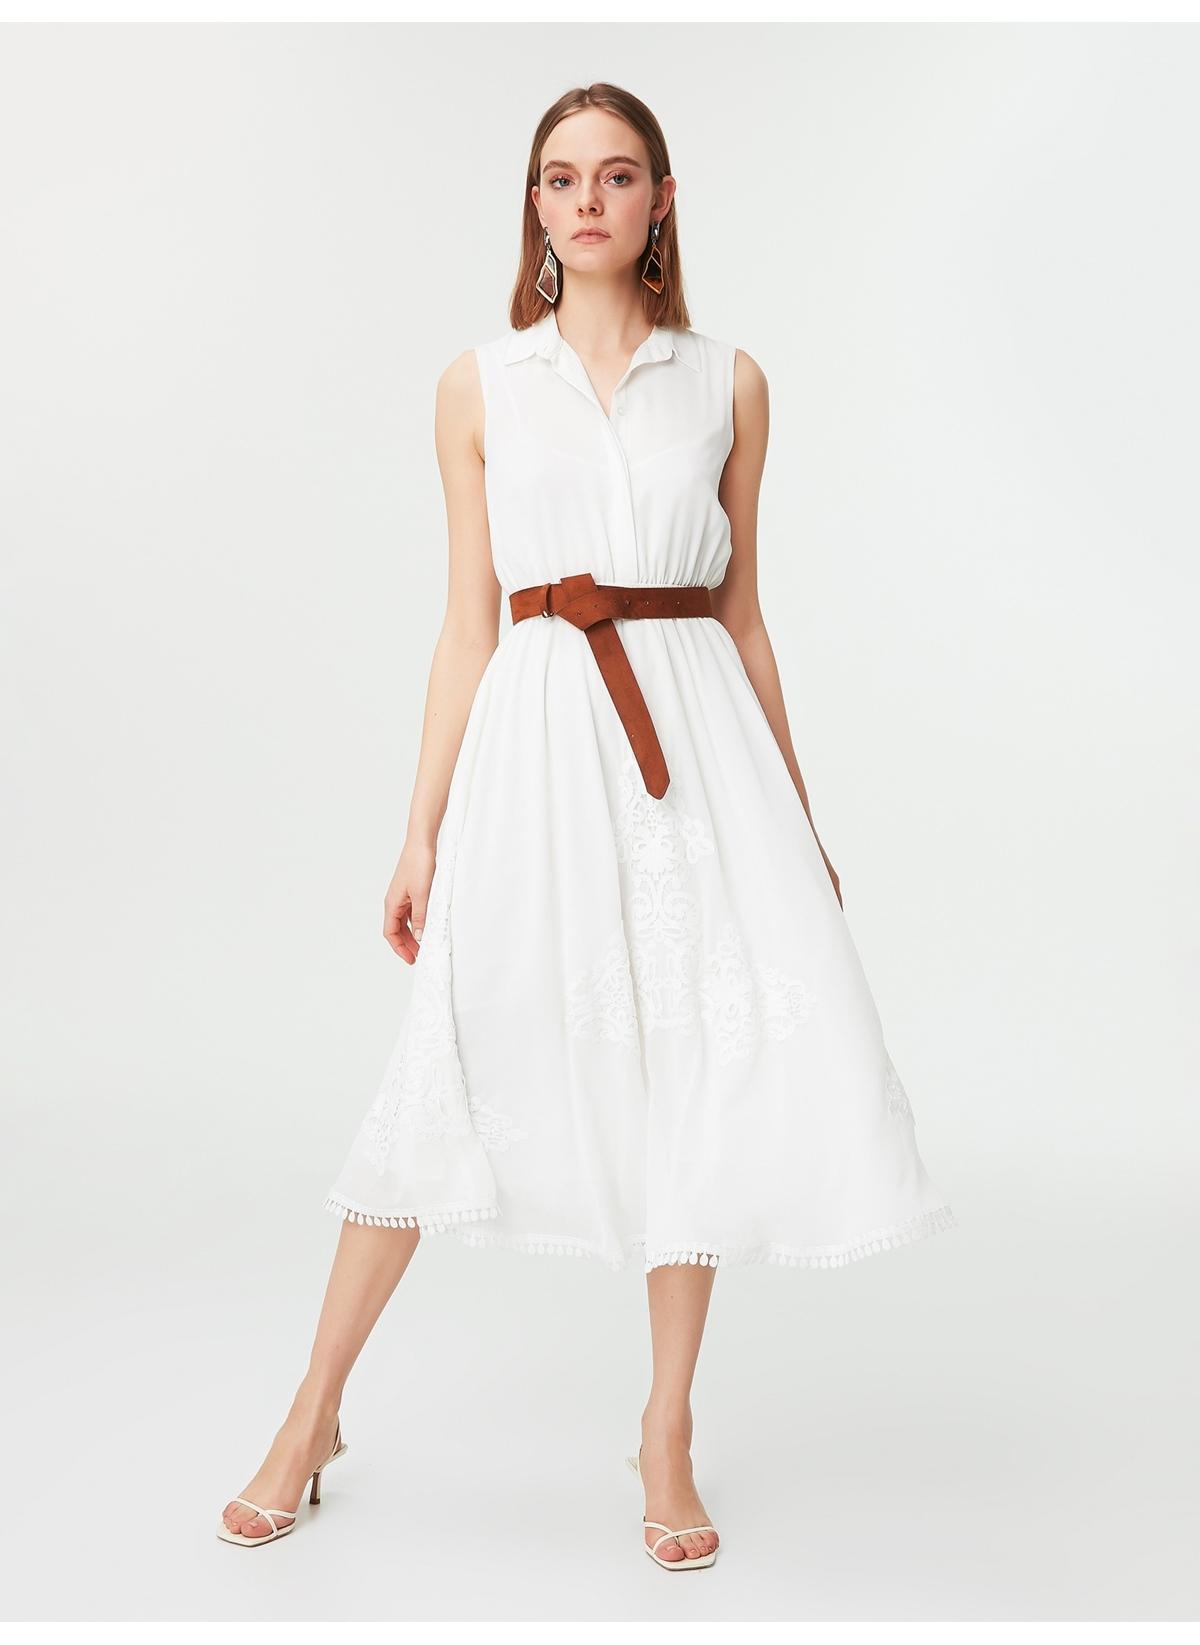 b58a516387d77 Ipekyol Kadın Elbise Beyaz - Glami.com.tr